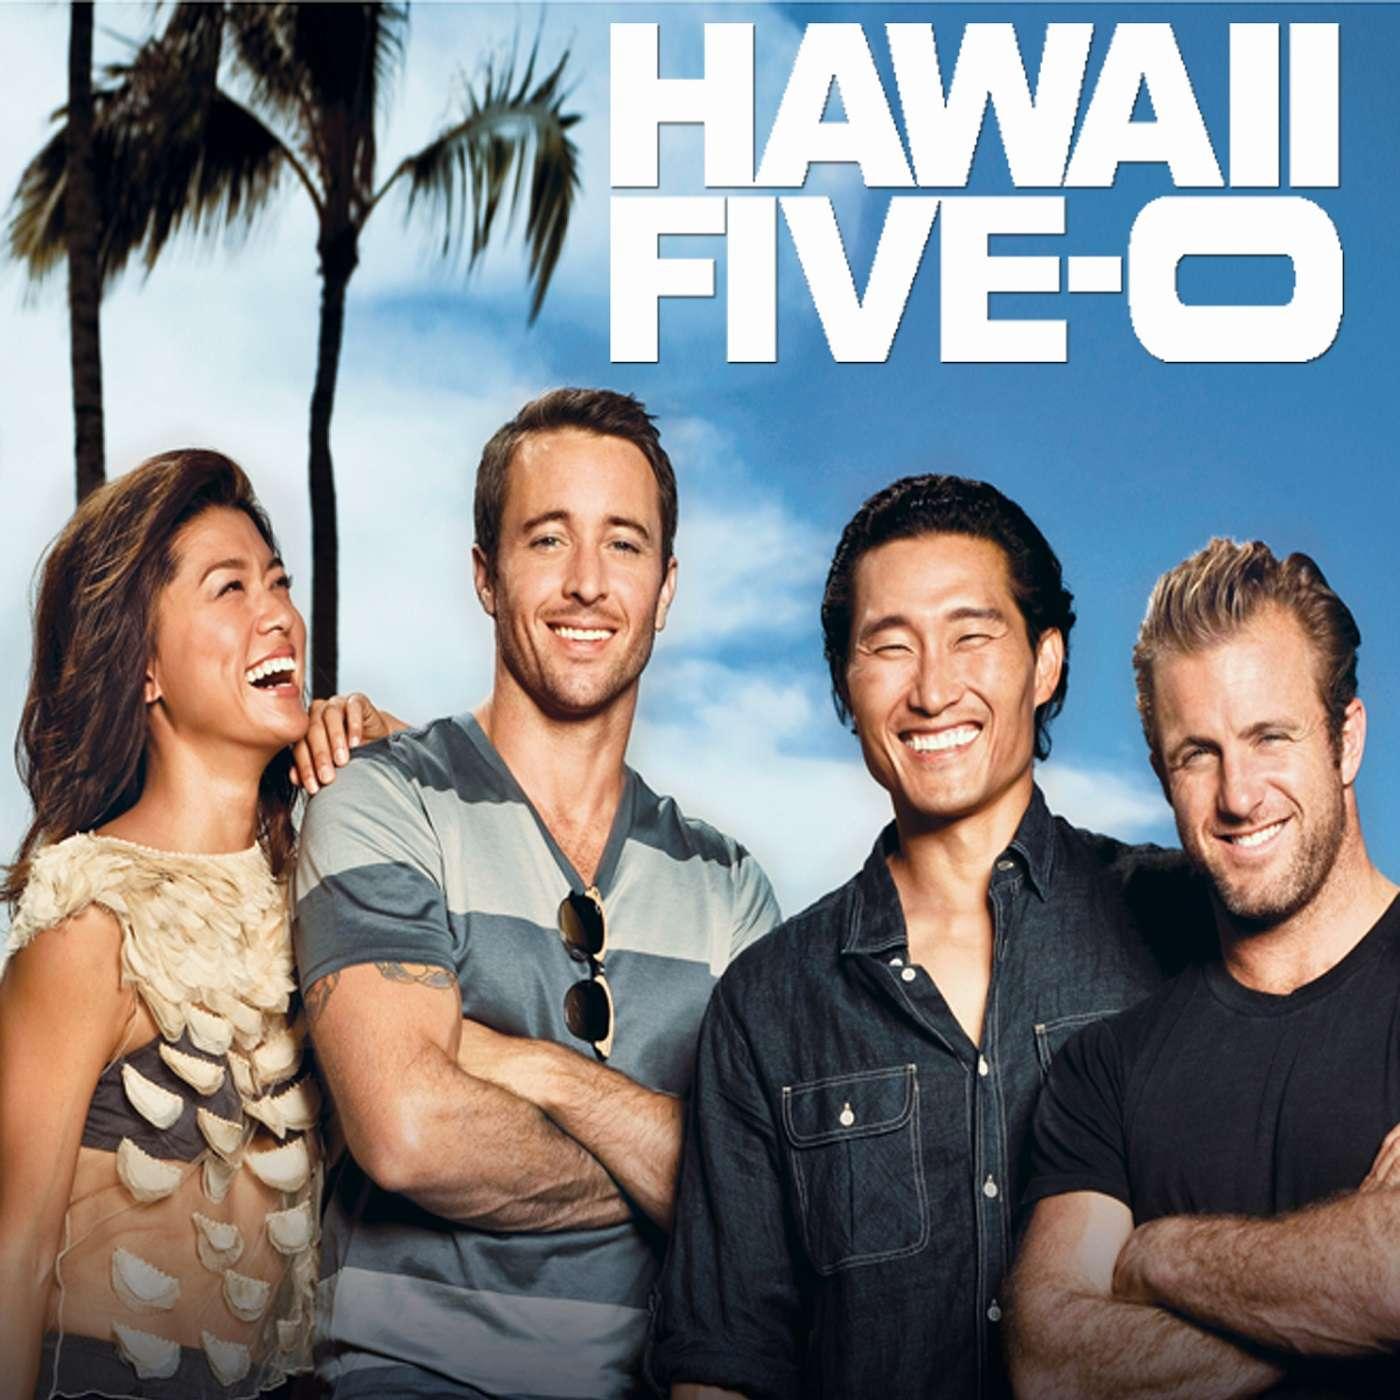 Hawaii Five-0 | DVDRip | Seasons 01-04 | S04E22